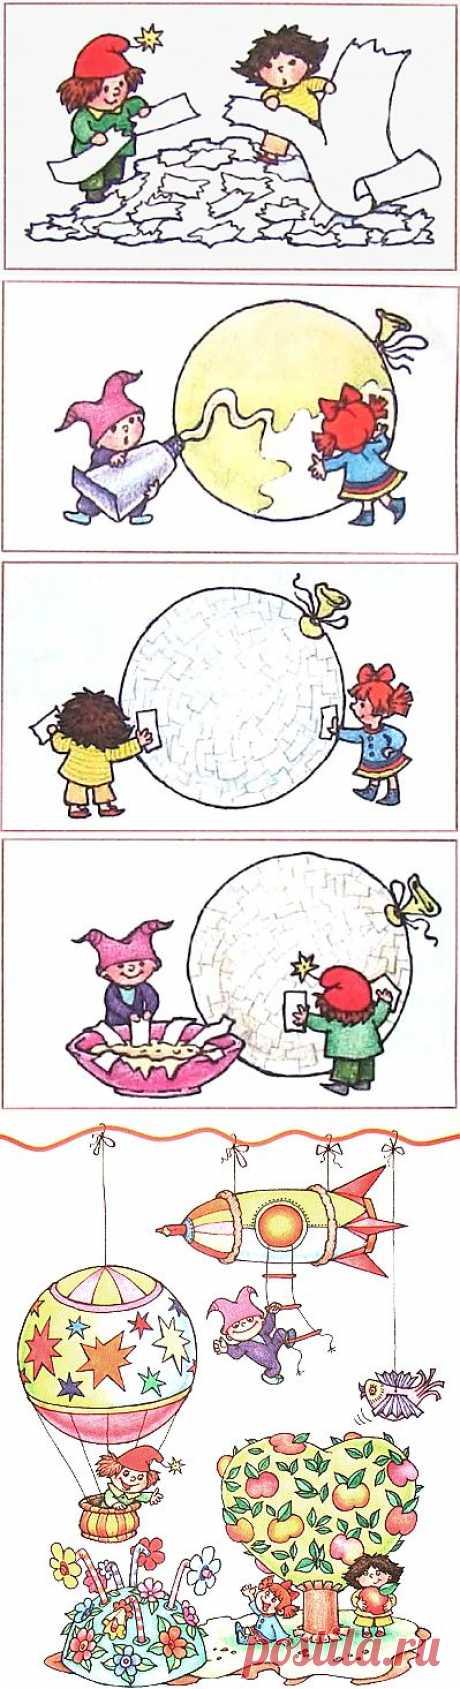 Папье-маше на воздушном шарике :: Поделки в технике папье-маше